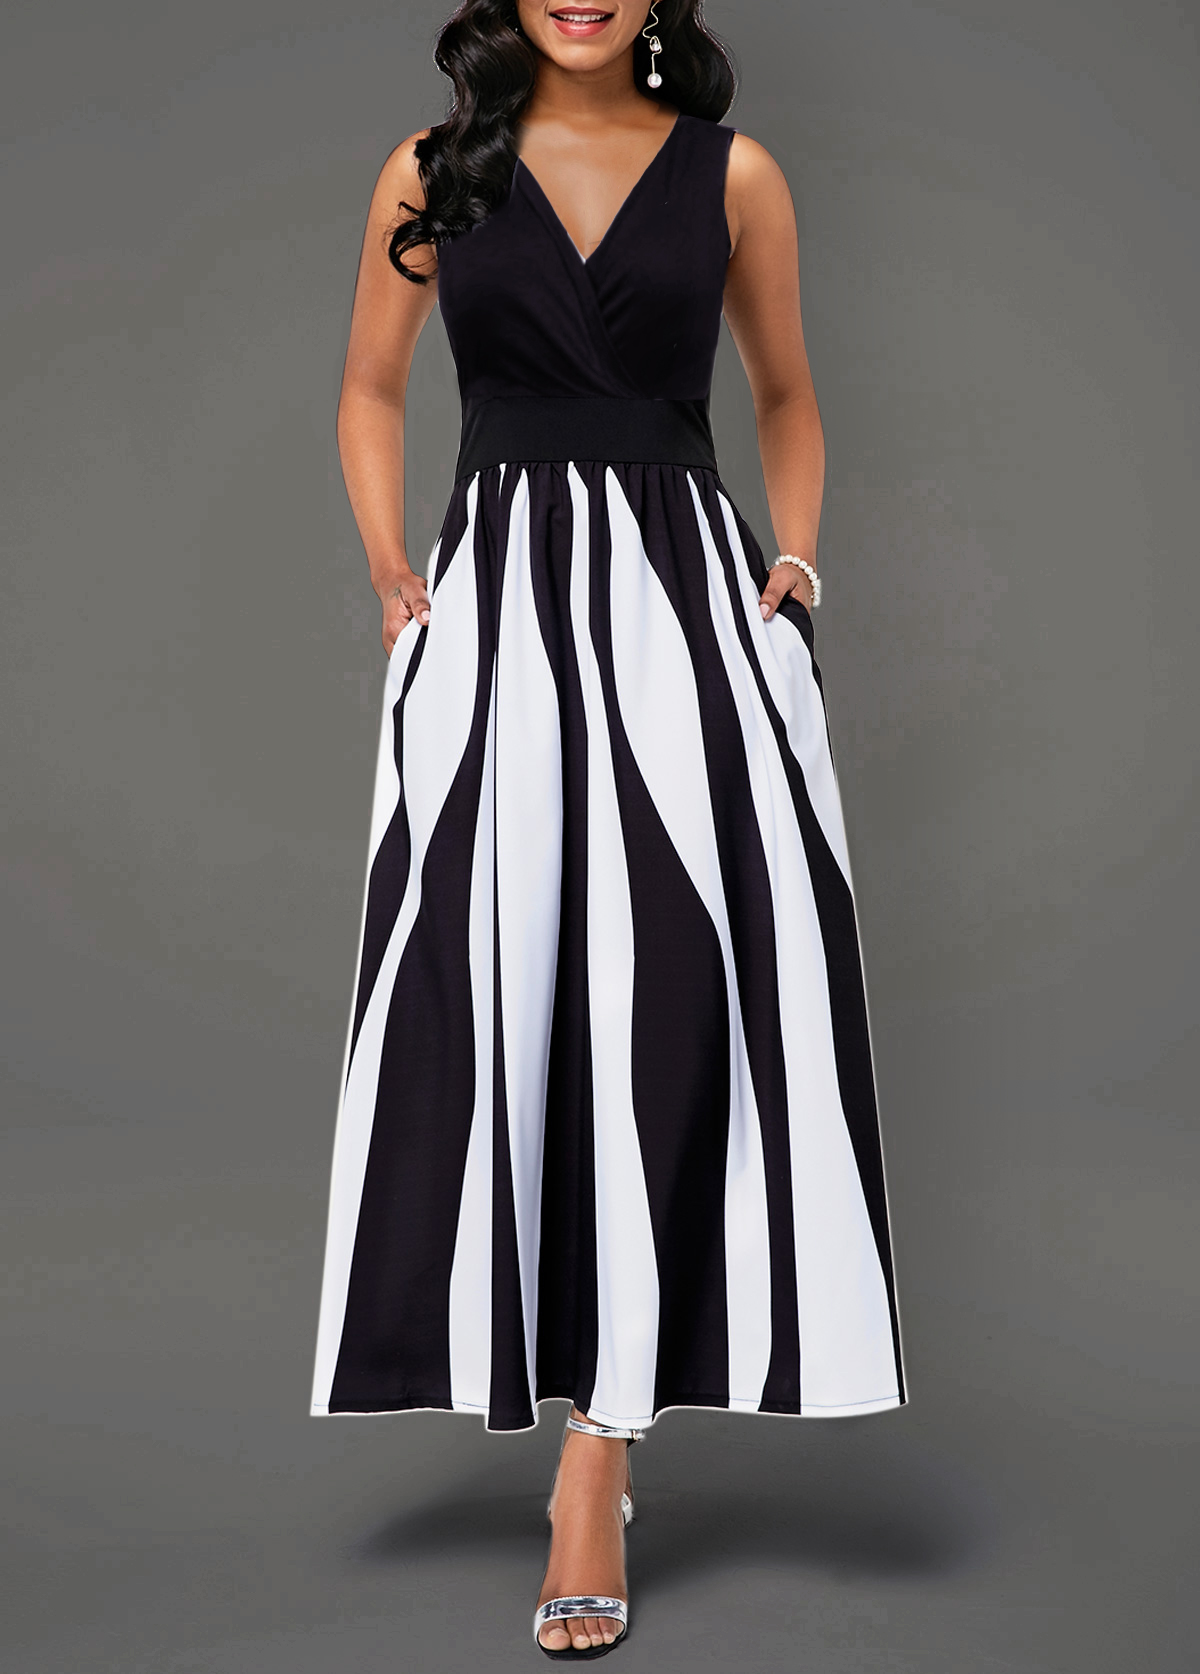 Sleeveless V Neck Color Block Dress